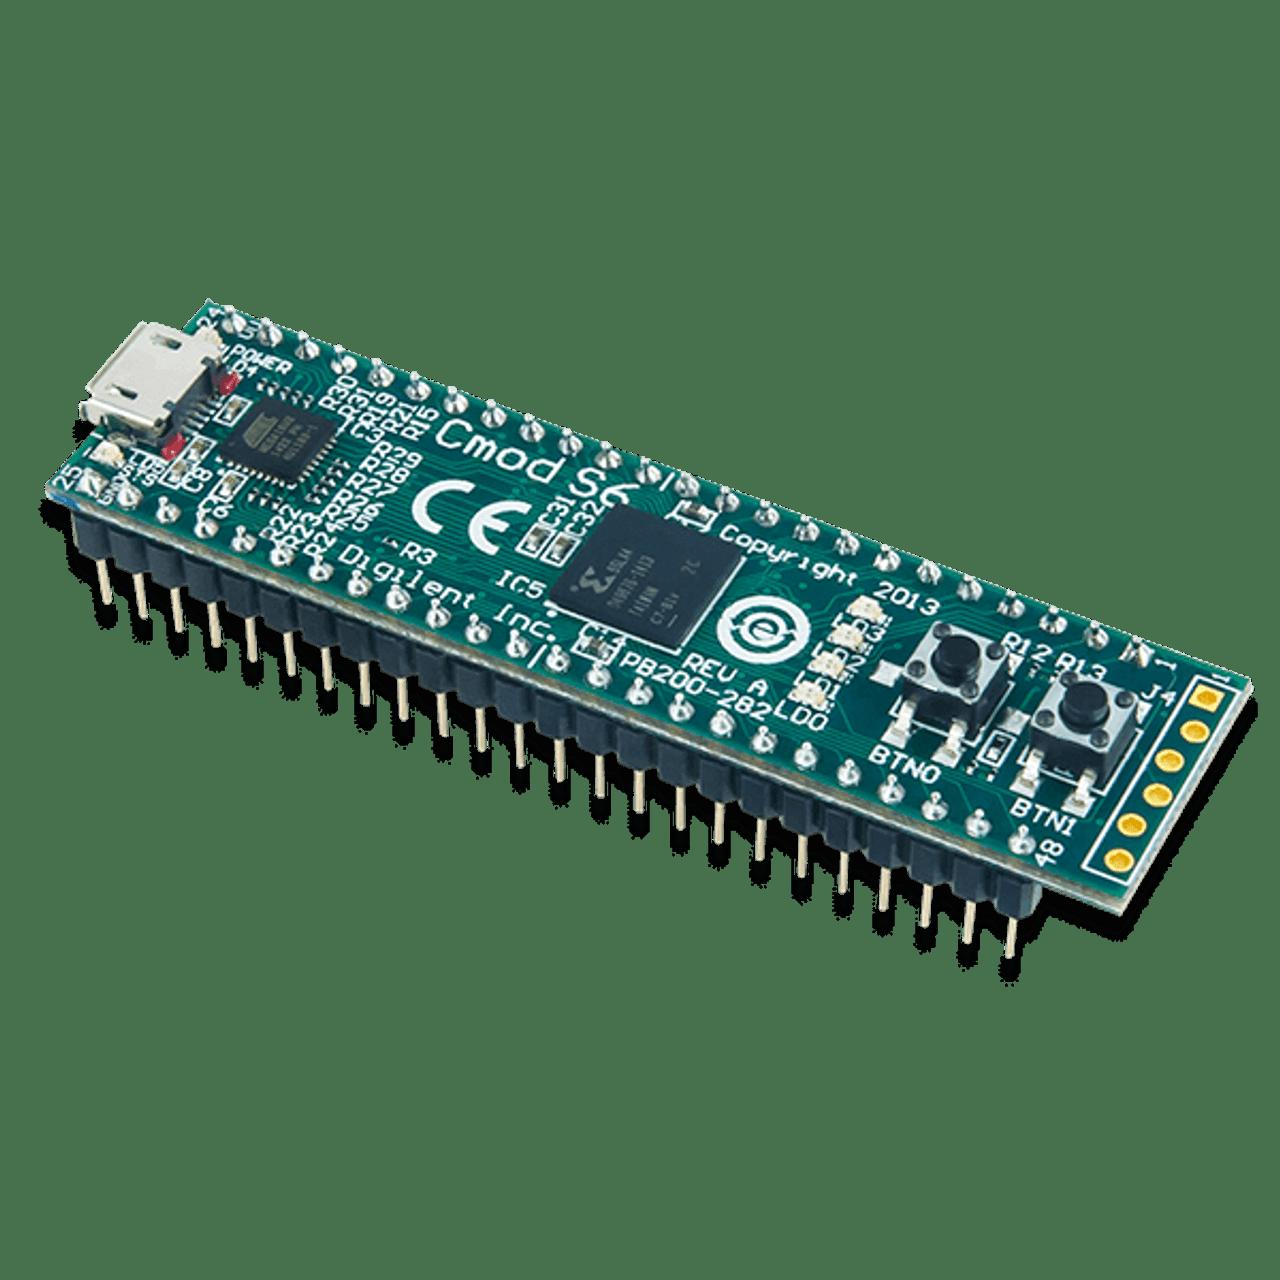 Cmod S6:即用型 Xilinx Spartan-6 FPGA 麵包板 │ DIP封裝